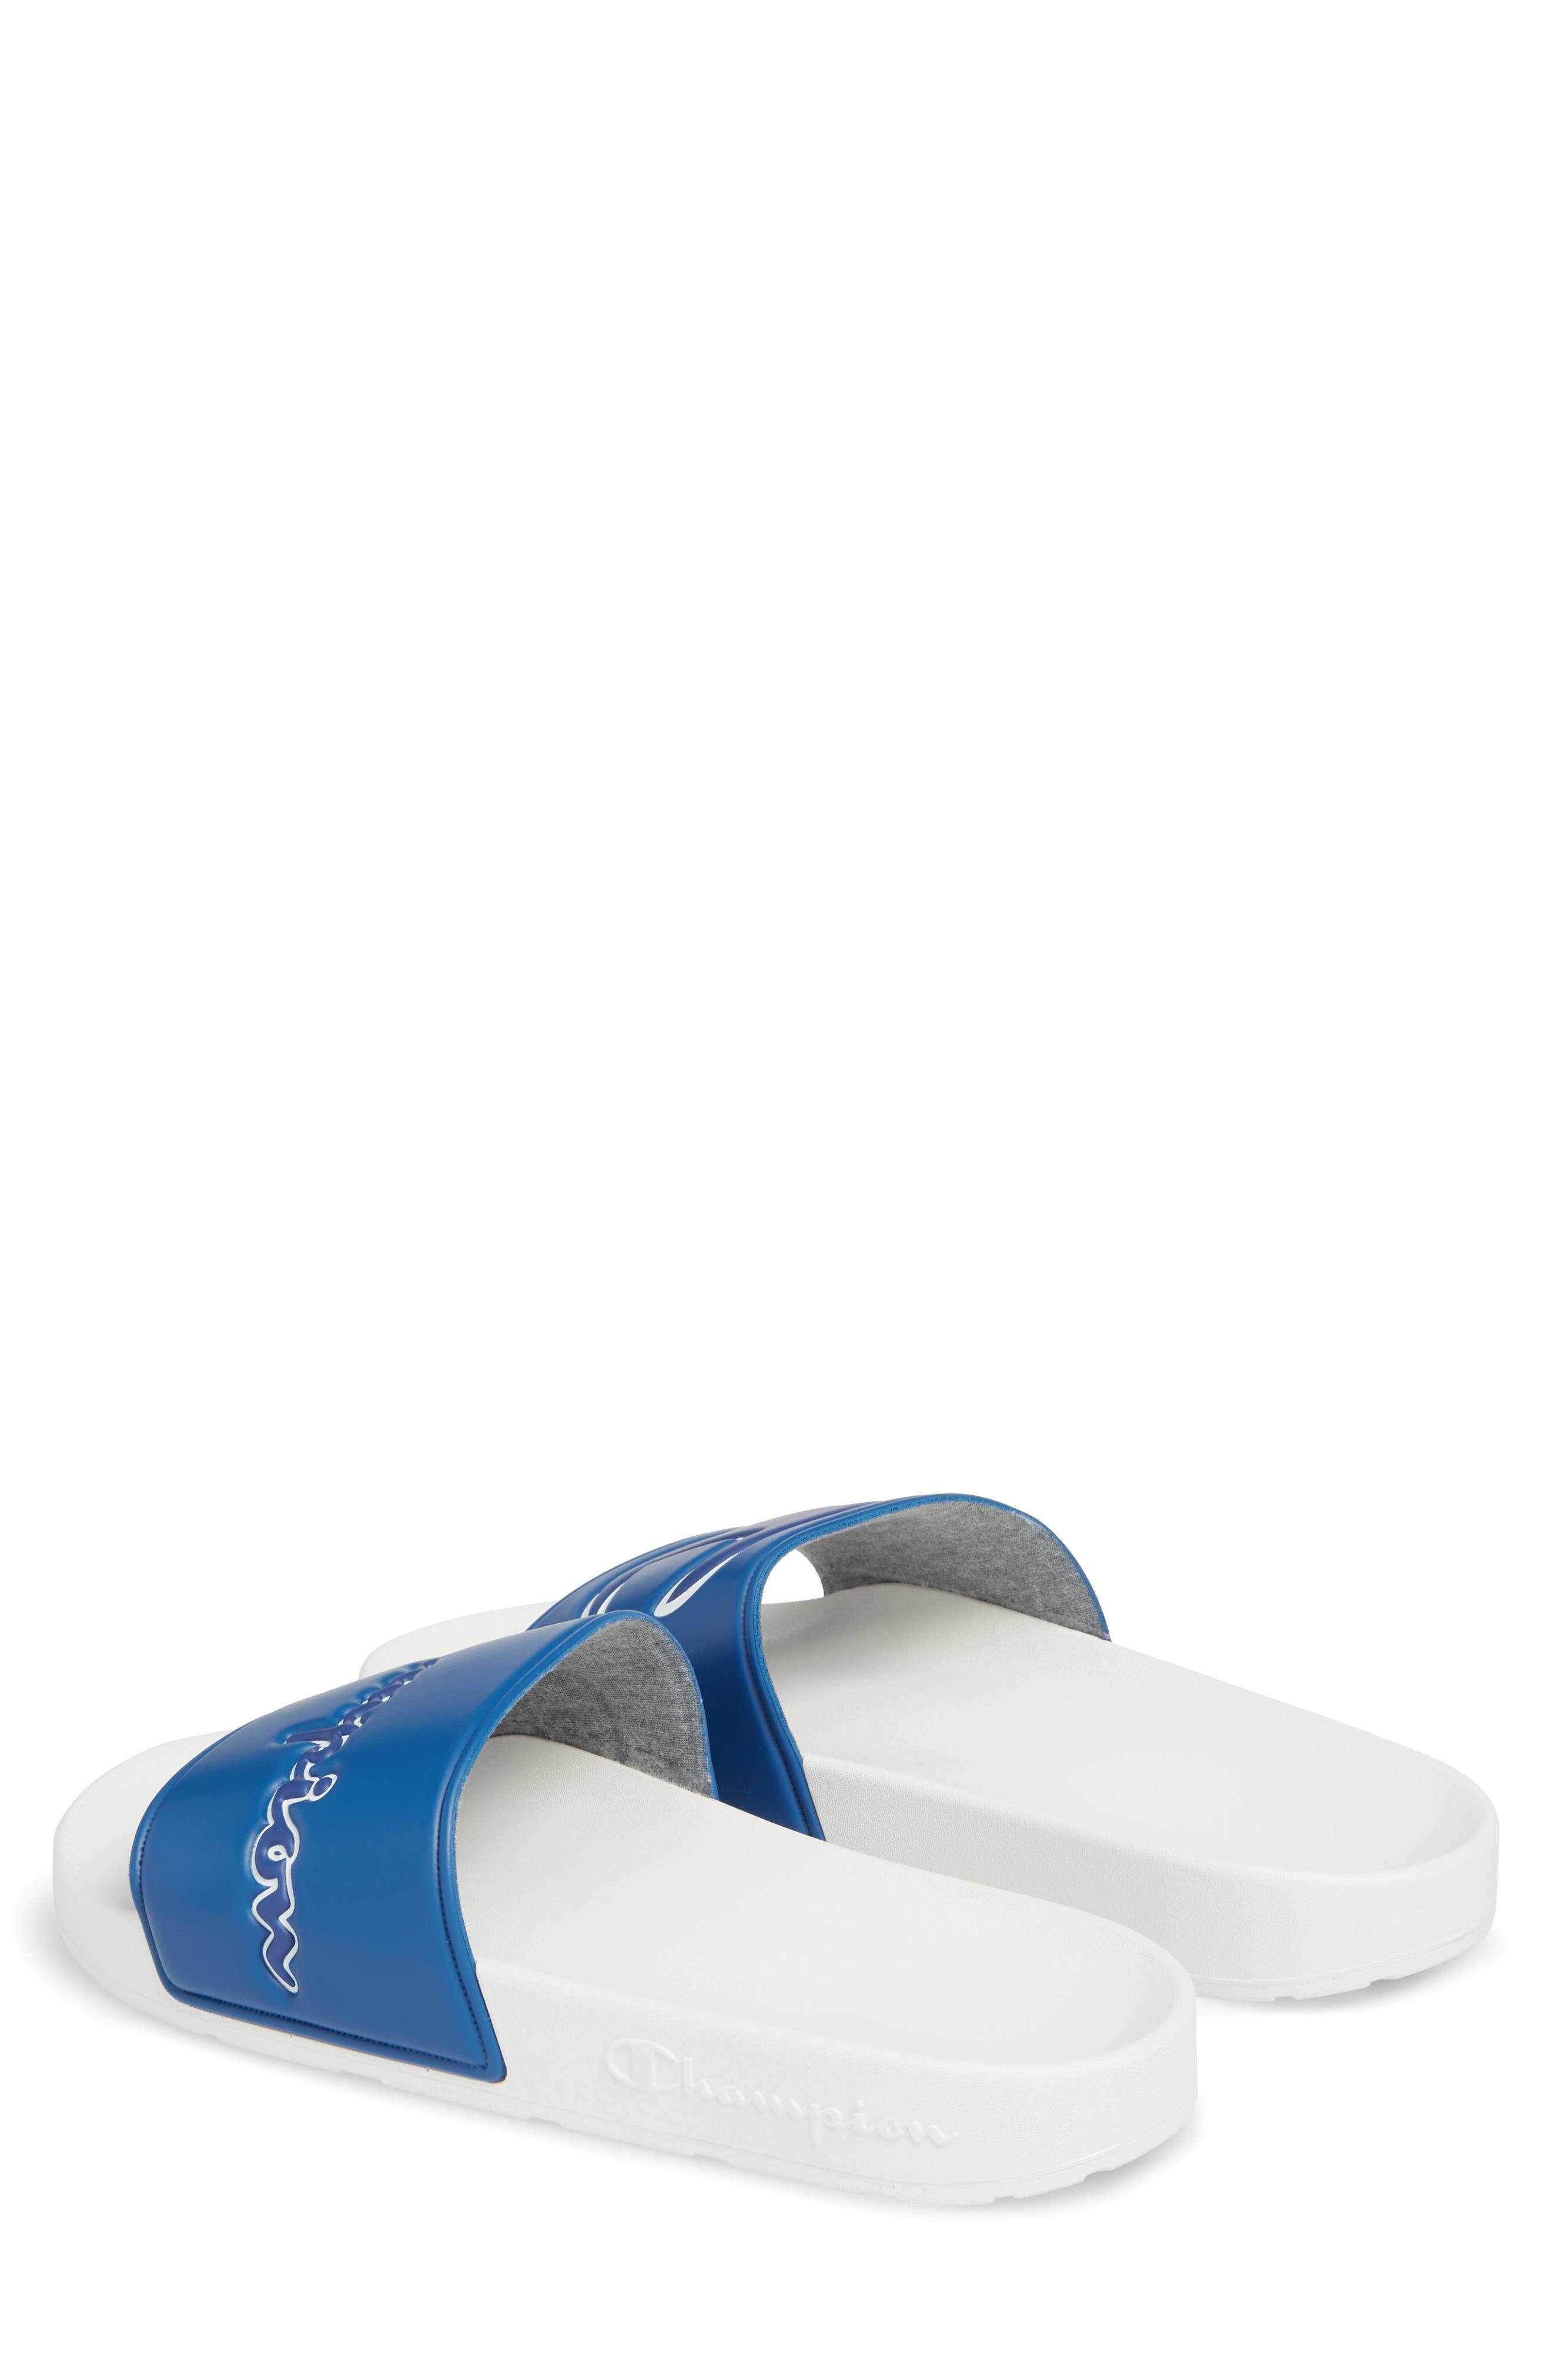 IPO Sport Slide Sandal,                             Alternate thumbnail 2, color,                             Royal